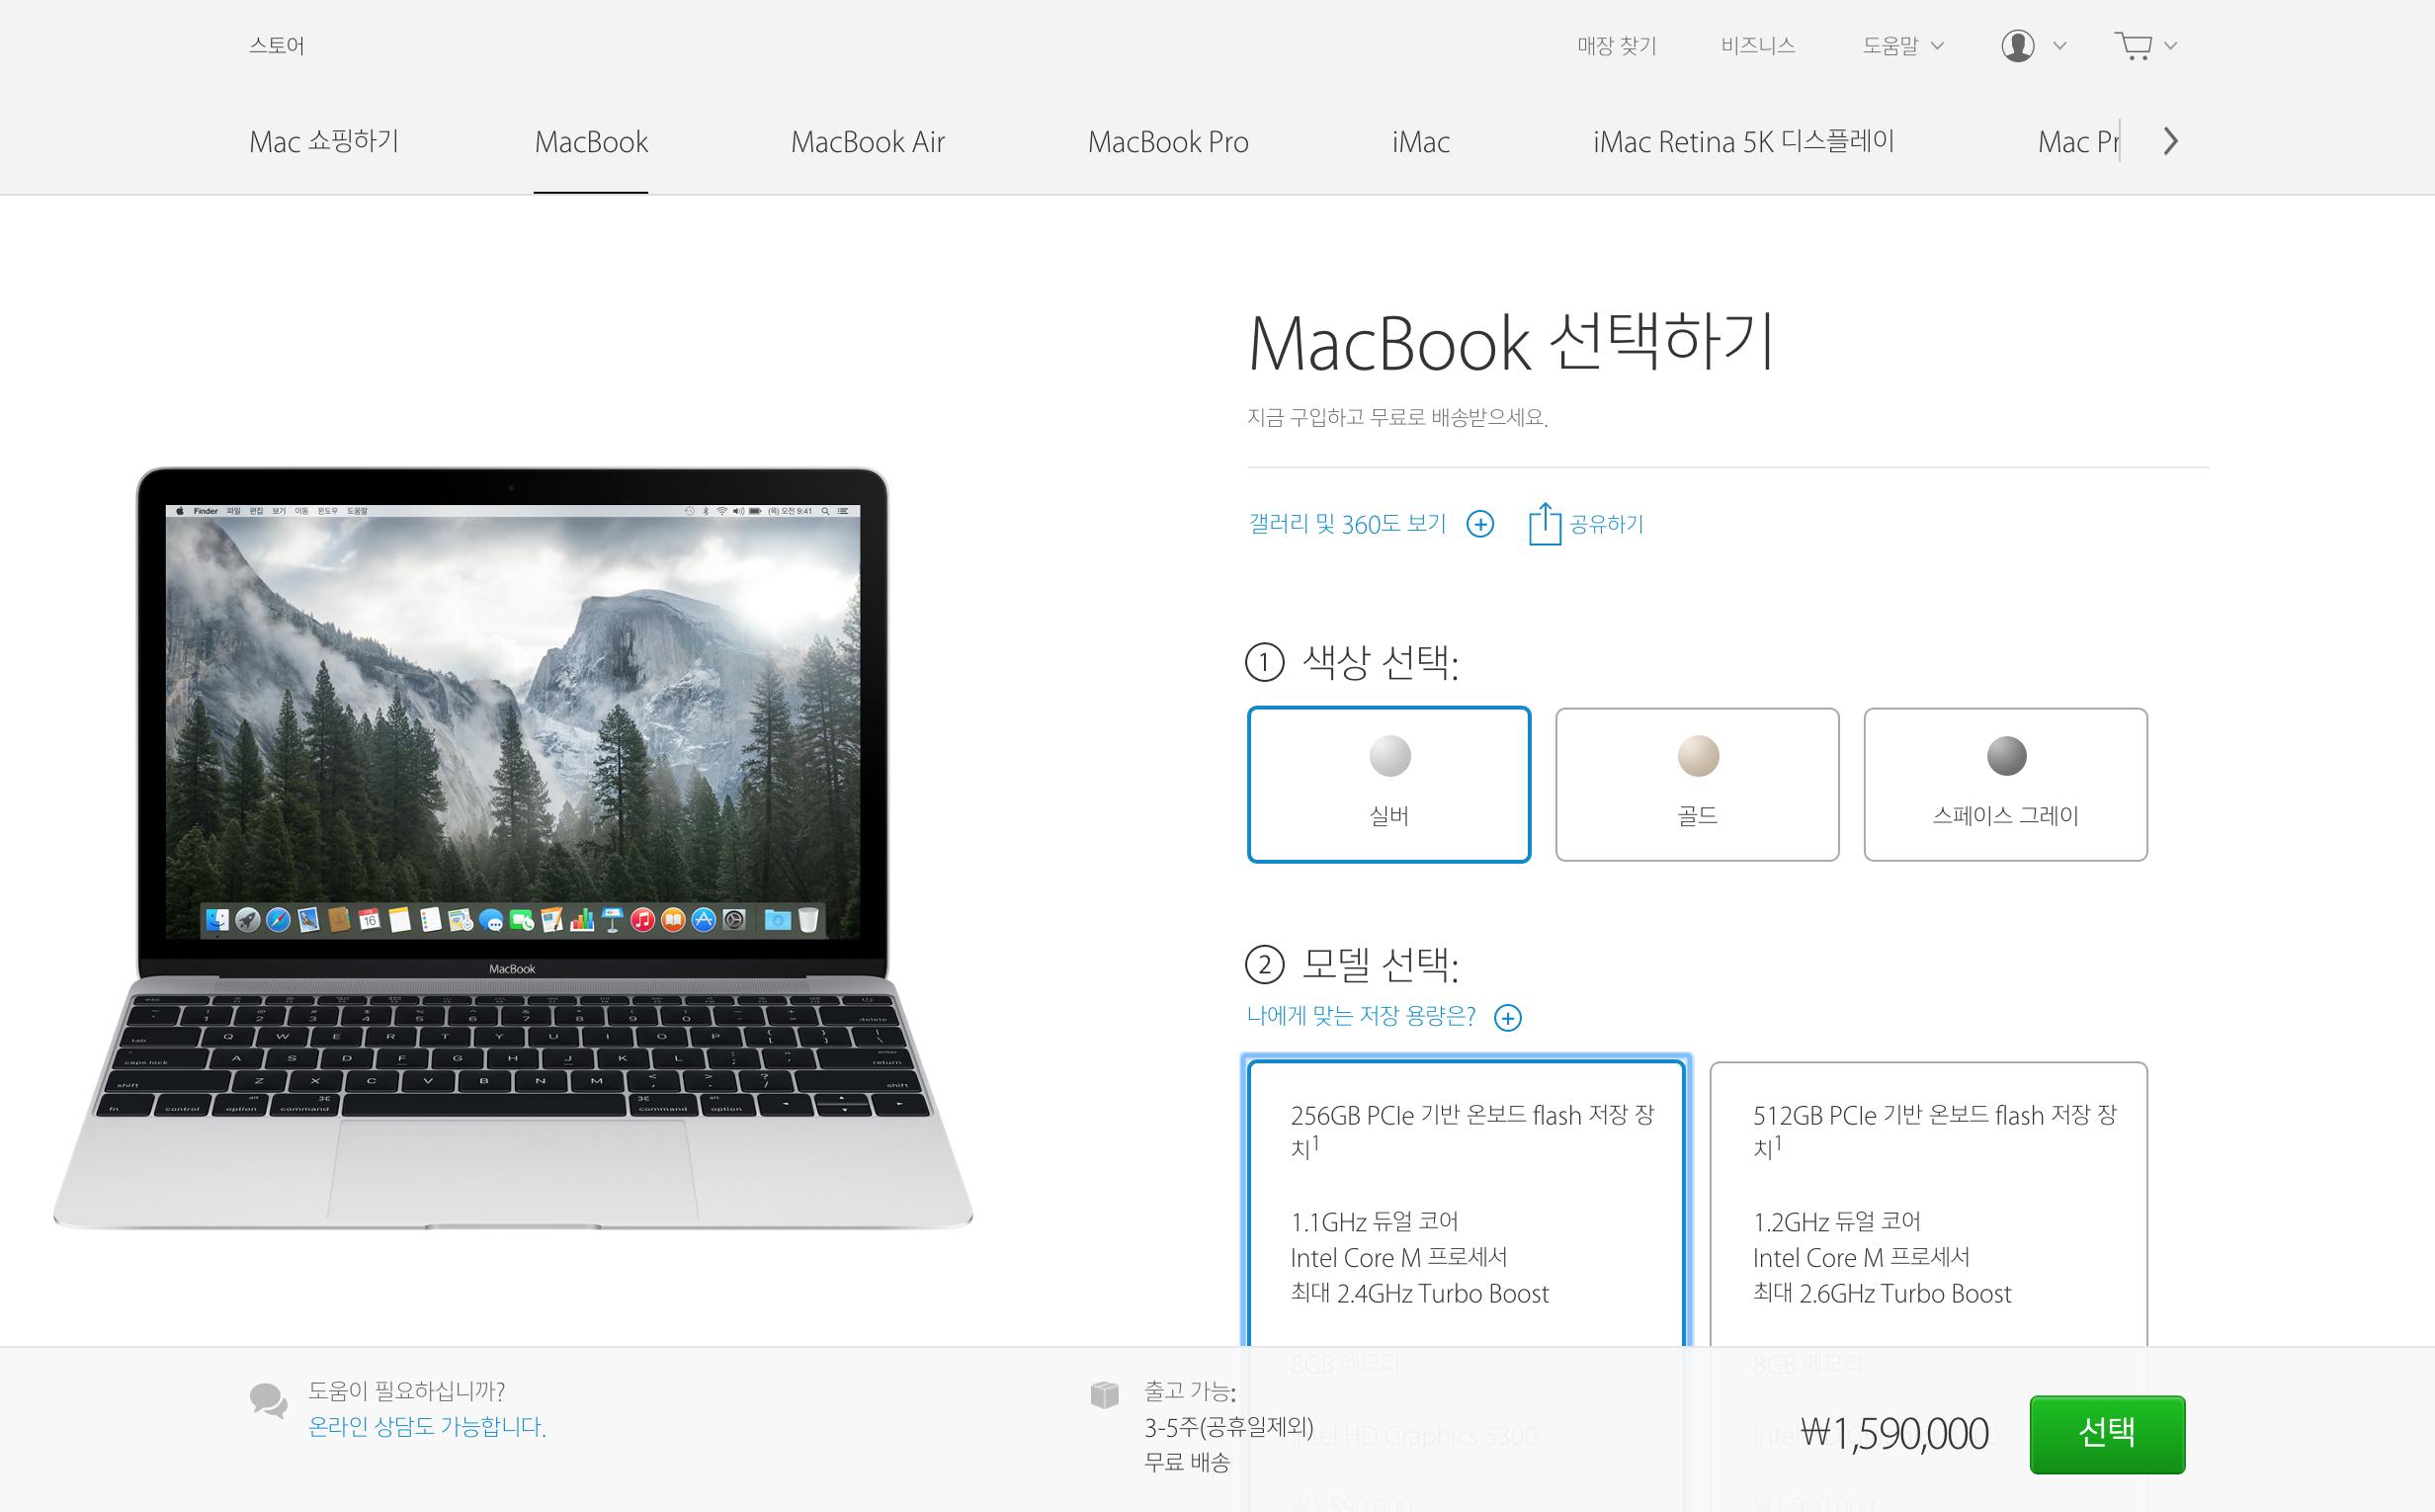 AOS. MacBook의 출하 예정일 단축.